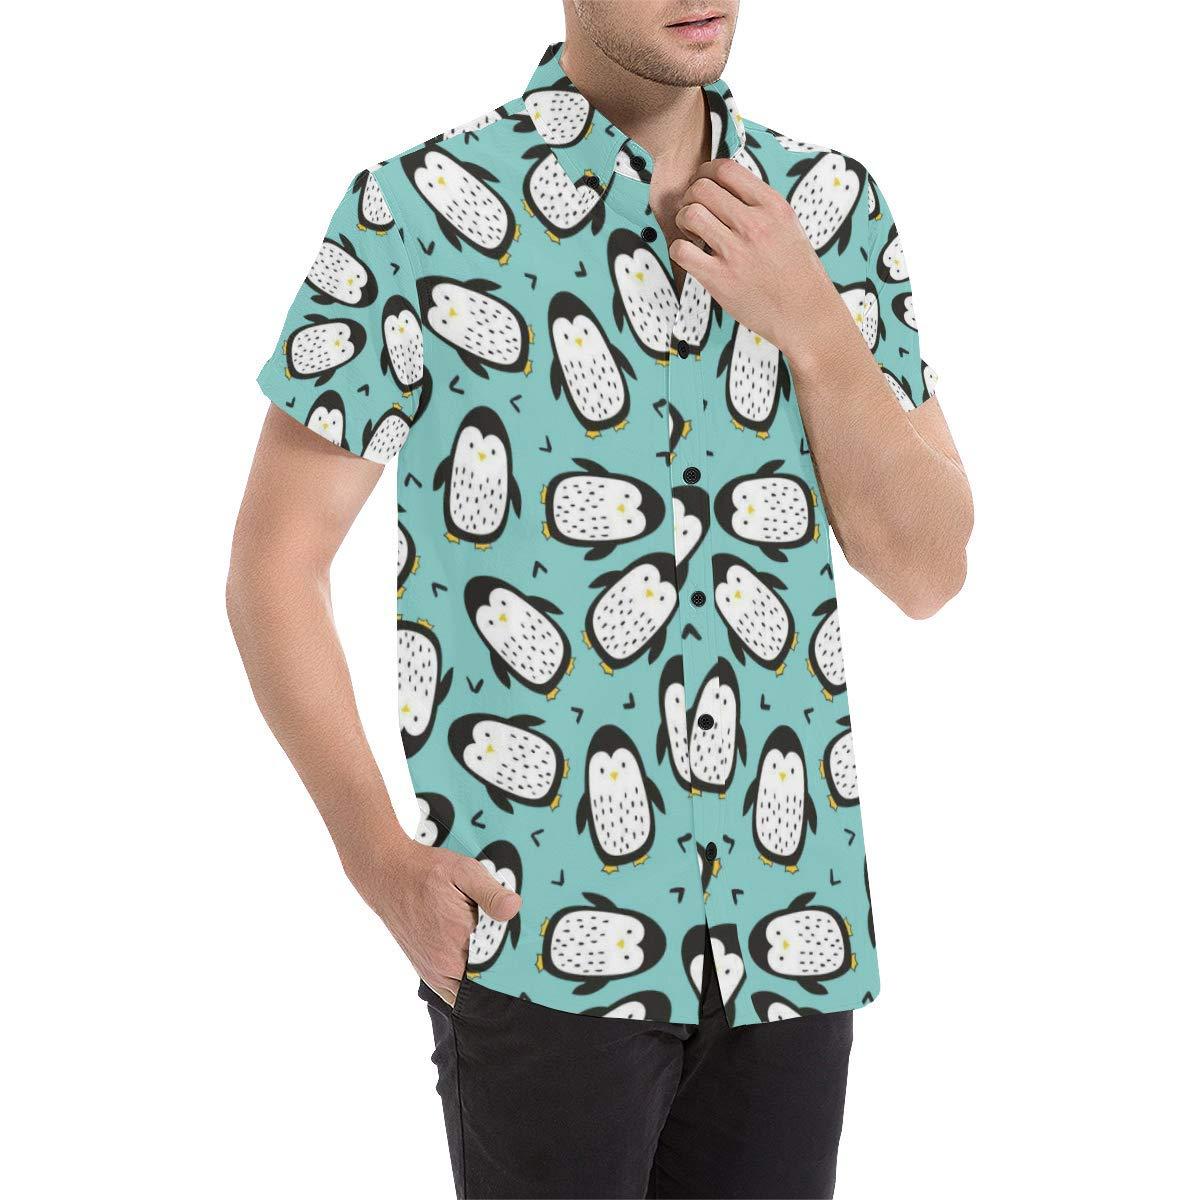 UlanLi Penguin Mens All Over Print Short Sleeve Shirt//Large Size